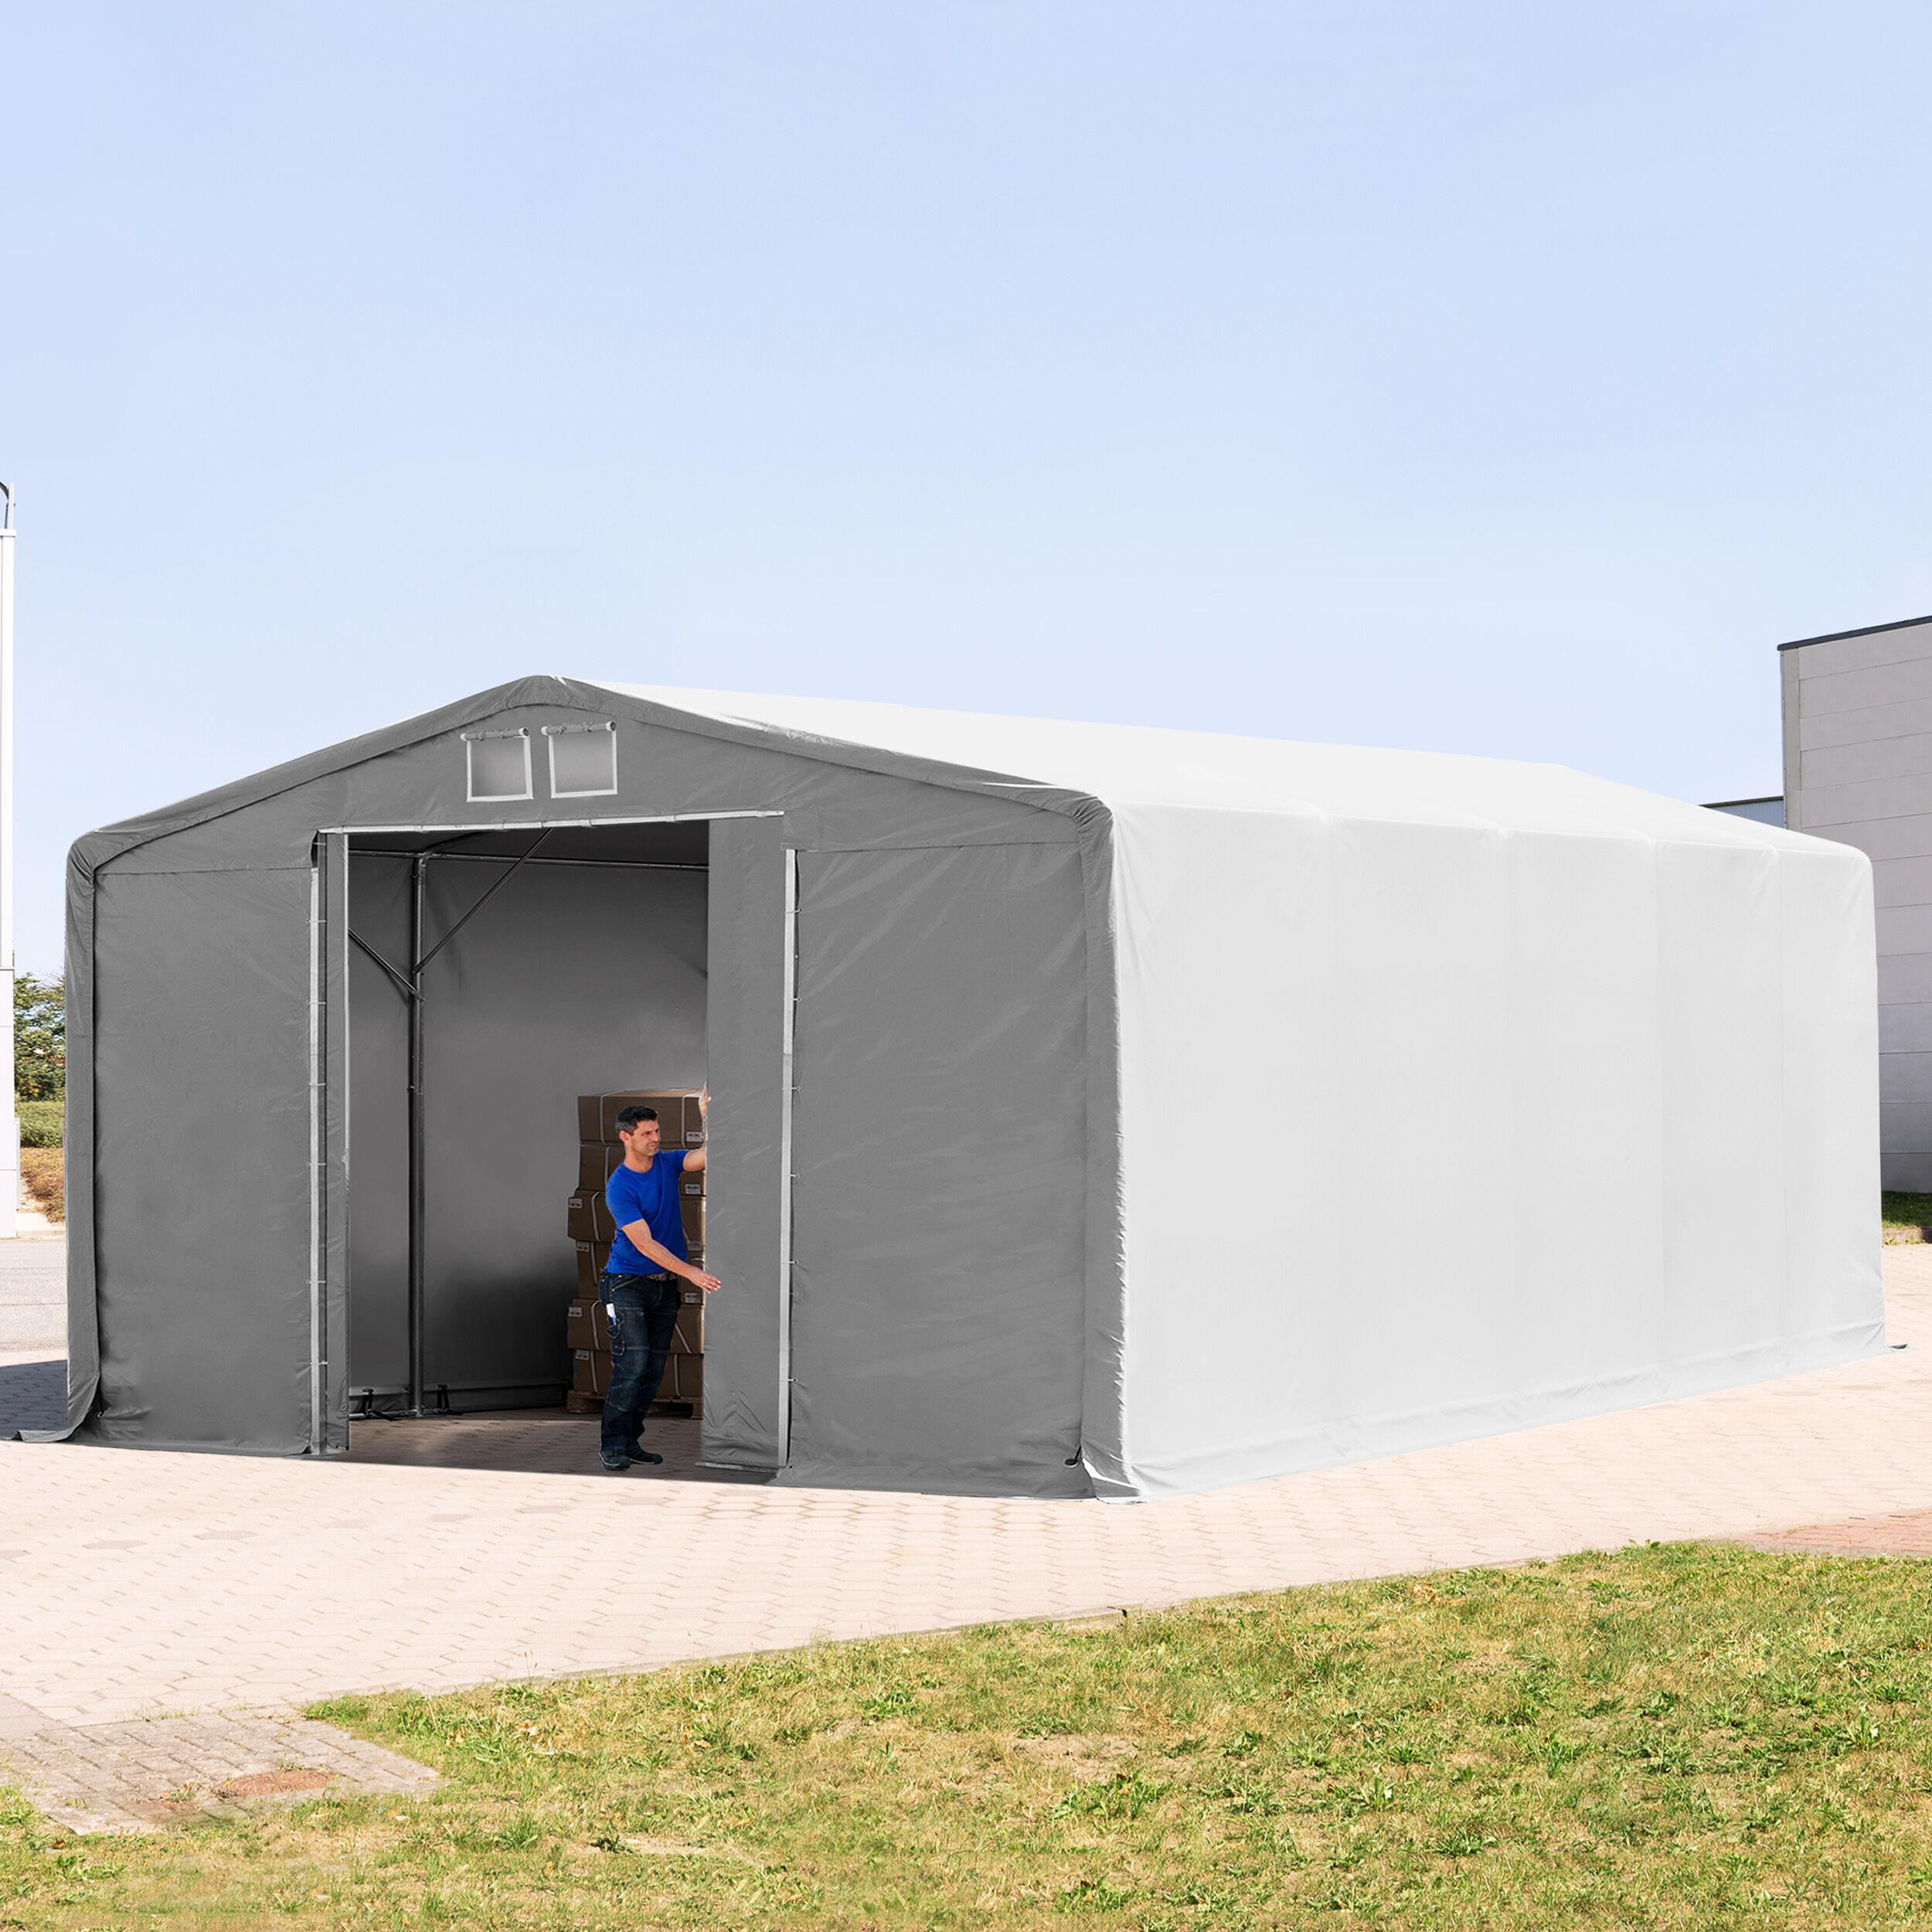 TOOLPORT Industrial Tent 8x10m PVC 550 g/m² grey waterproof